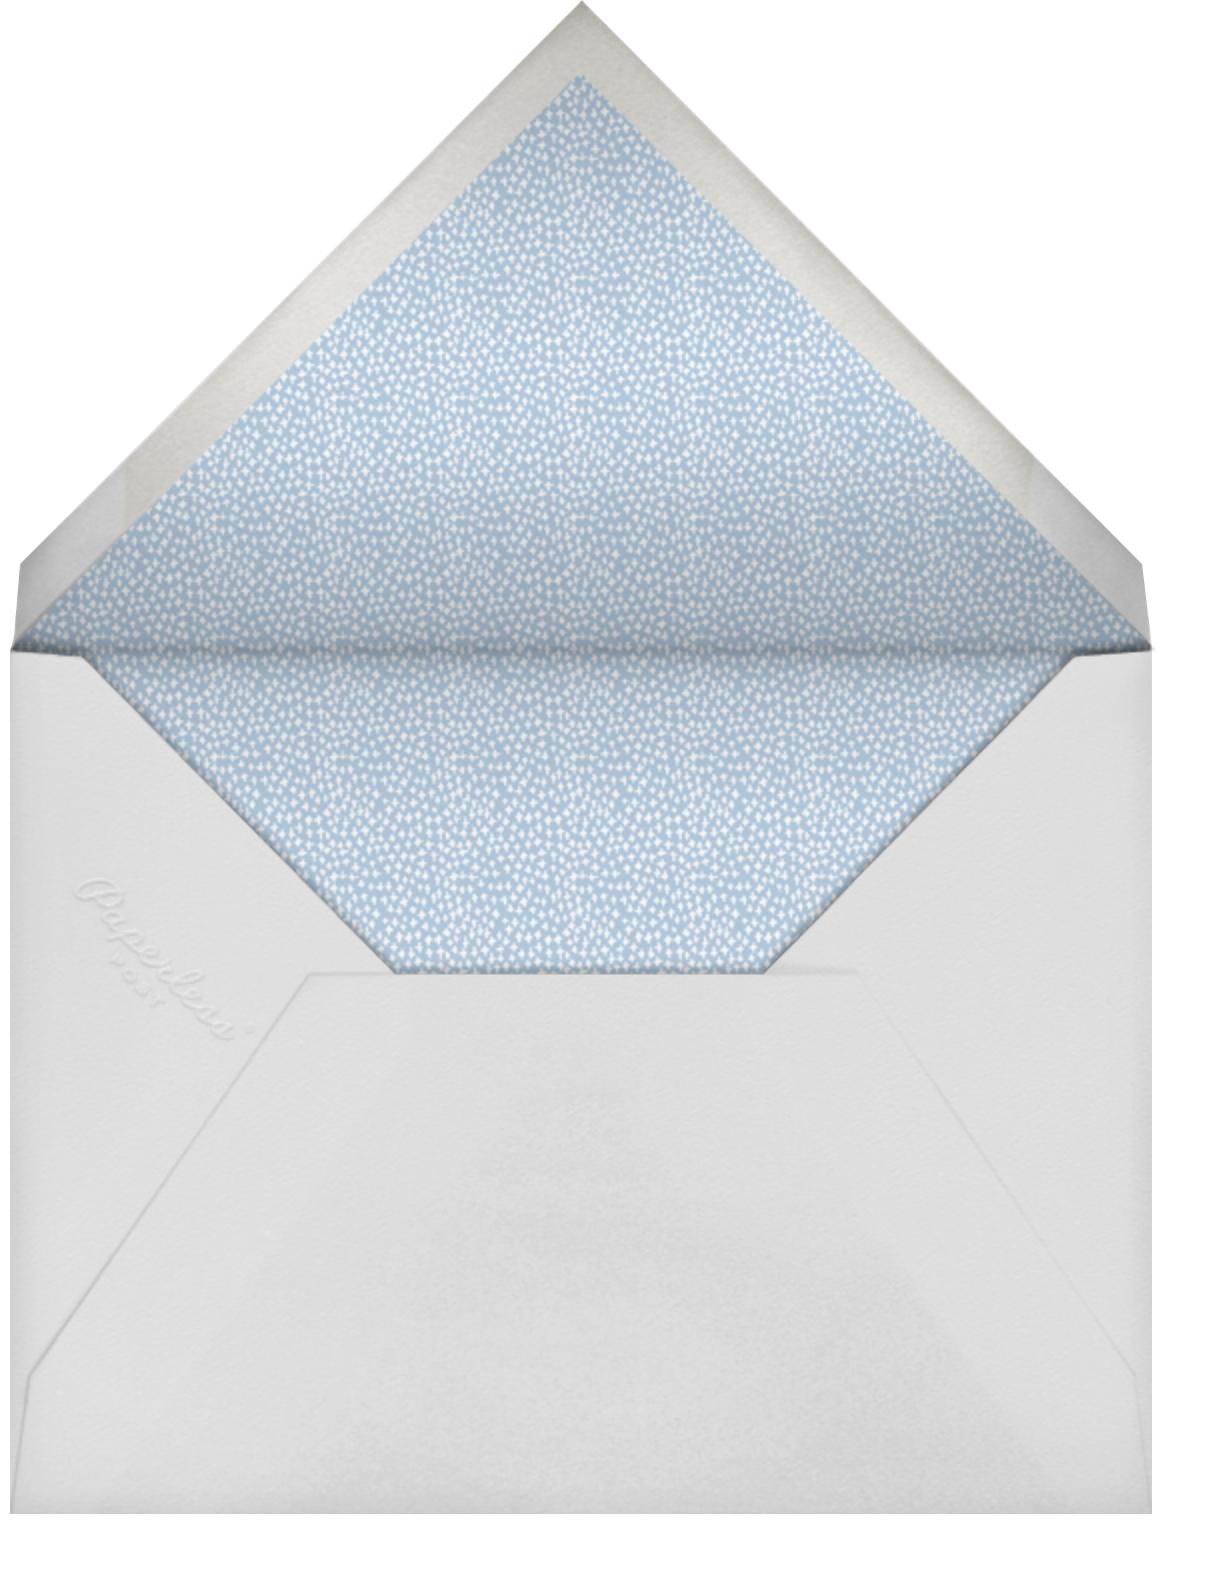 Laurel in Love - Peach - Mr. Boddington's Studio - Baptism  - envelope back